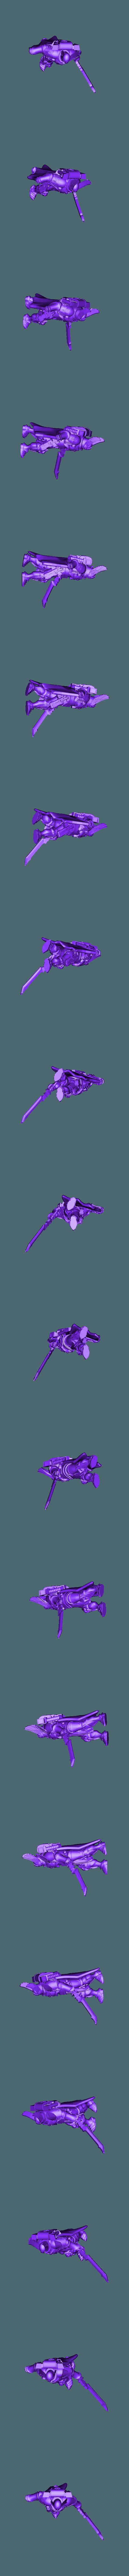 Legion_Master_repaired.stl Download free STL file Legion Master - The Phoenician • 3D print template, ThatEvilOne